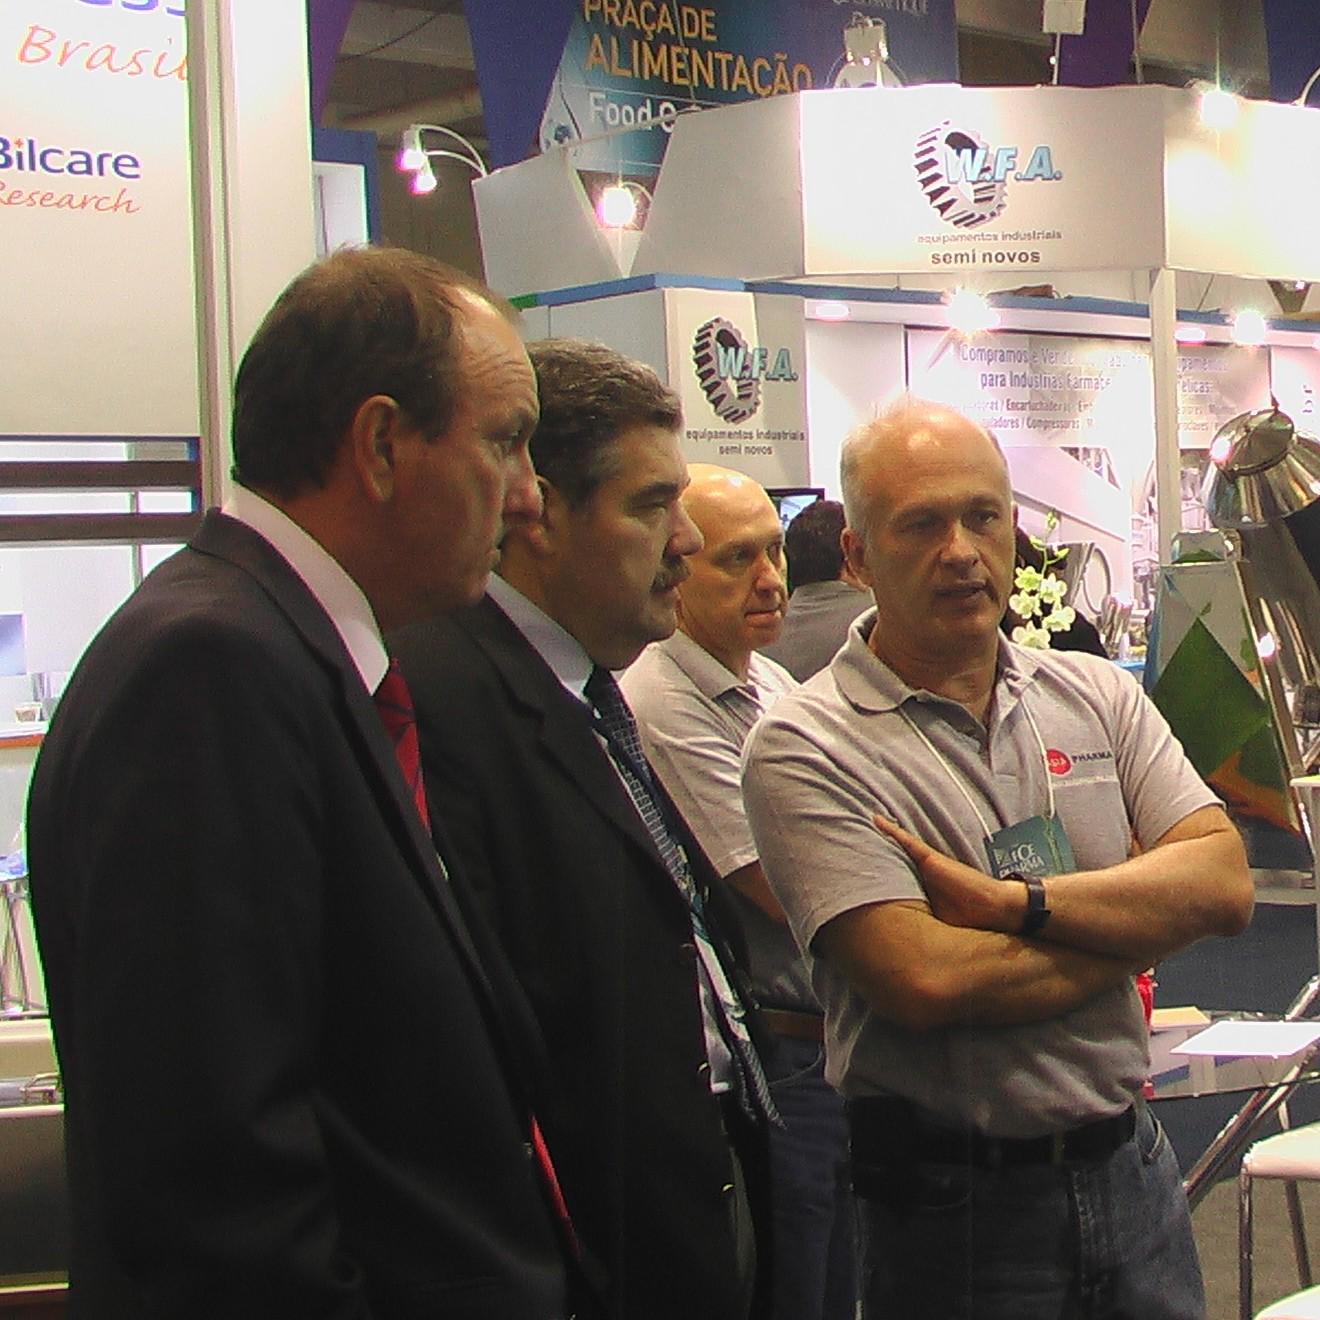 Participate FCE Brazil 2011